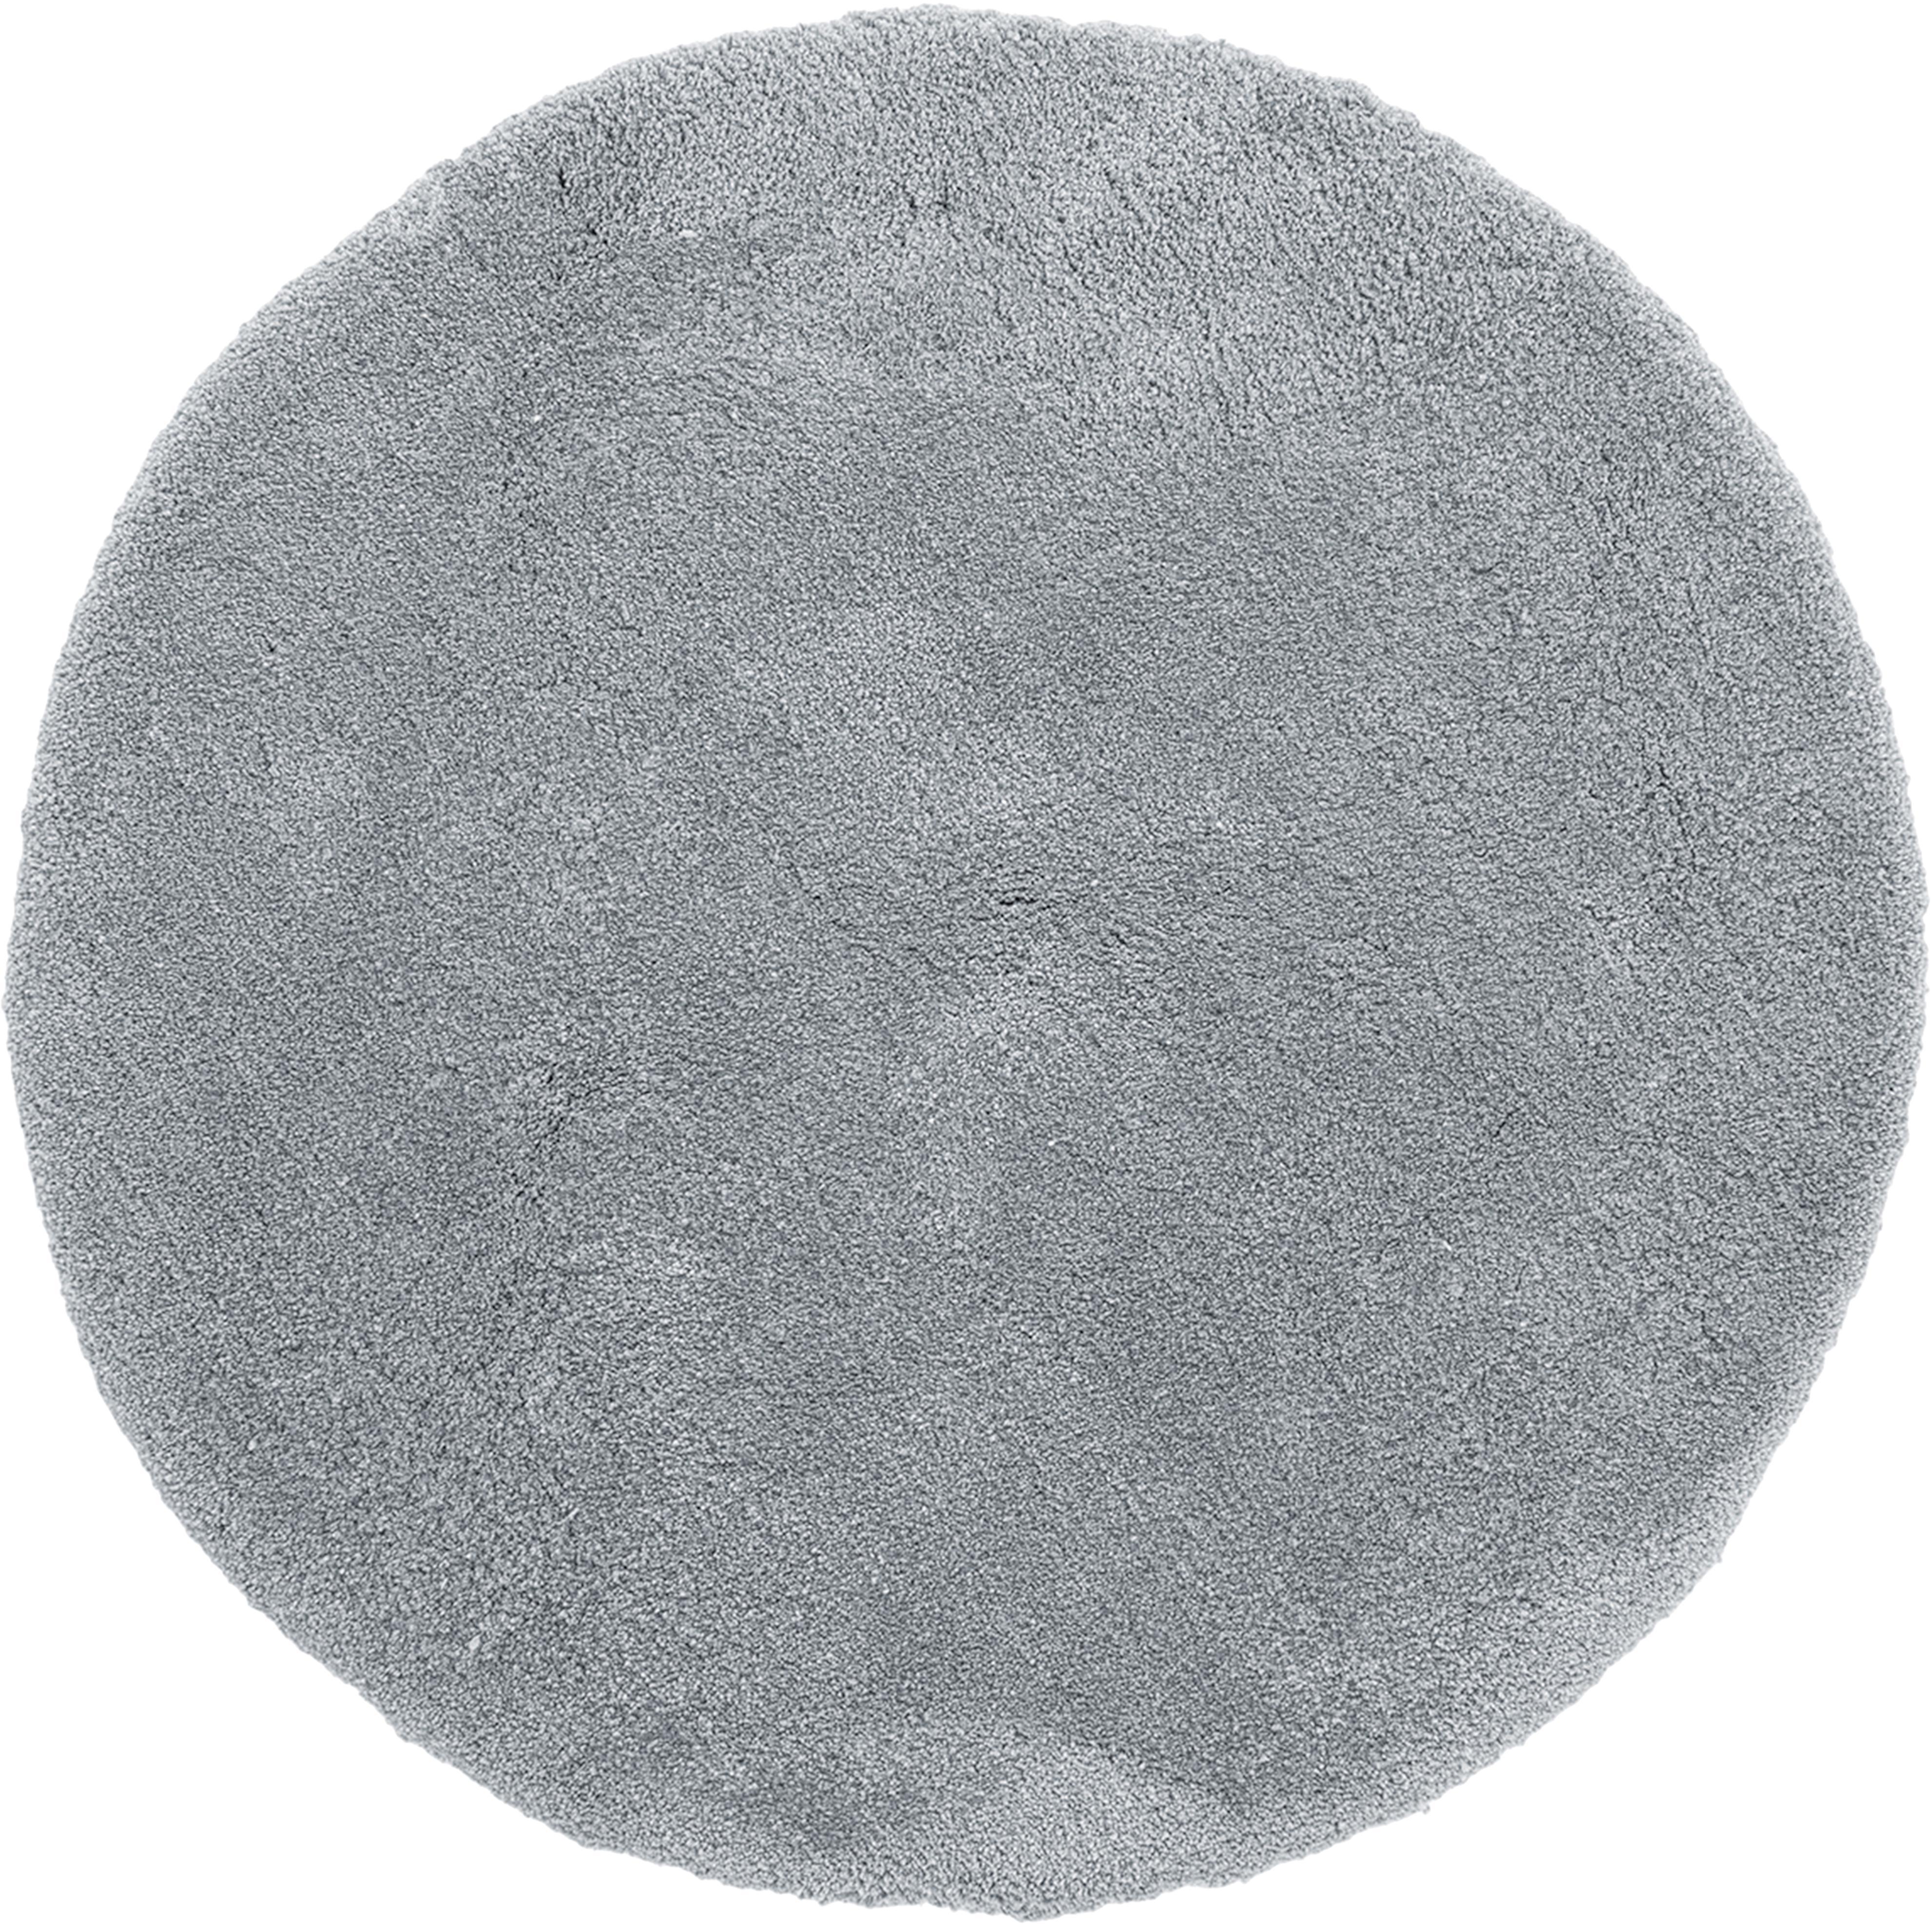 Alfombra redonda de pelo largo Leighton, Parte superior: 100%poliéster (microfibr, Reverso: 100%poliéster, Gris oscuro, Ø 200 cm (Tamaño L)